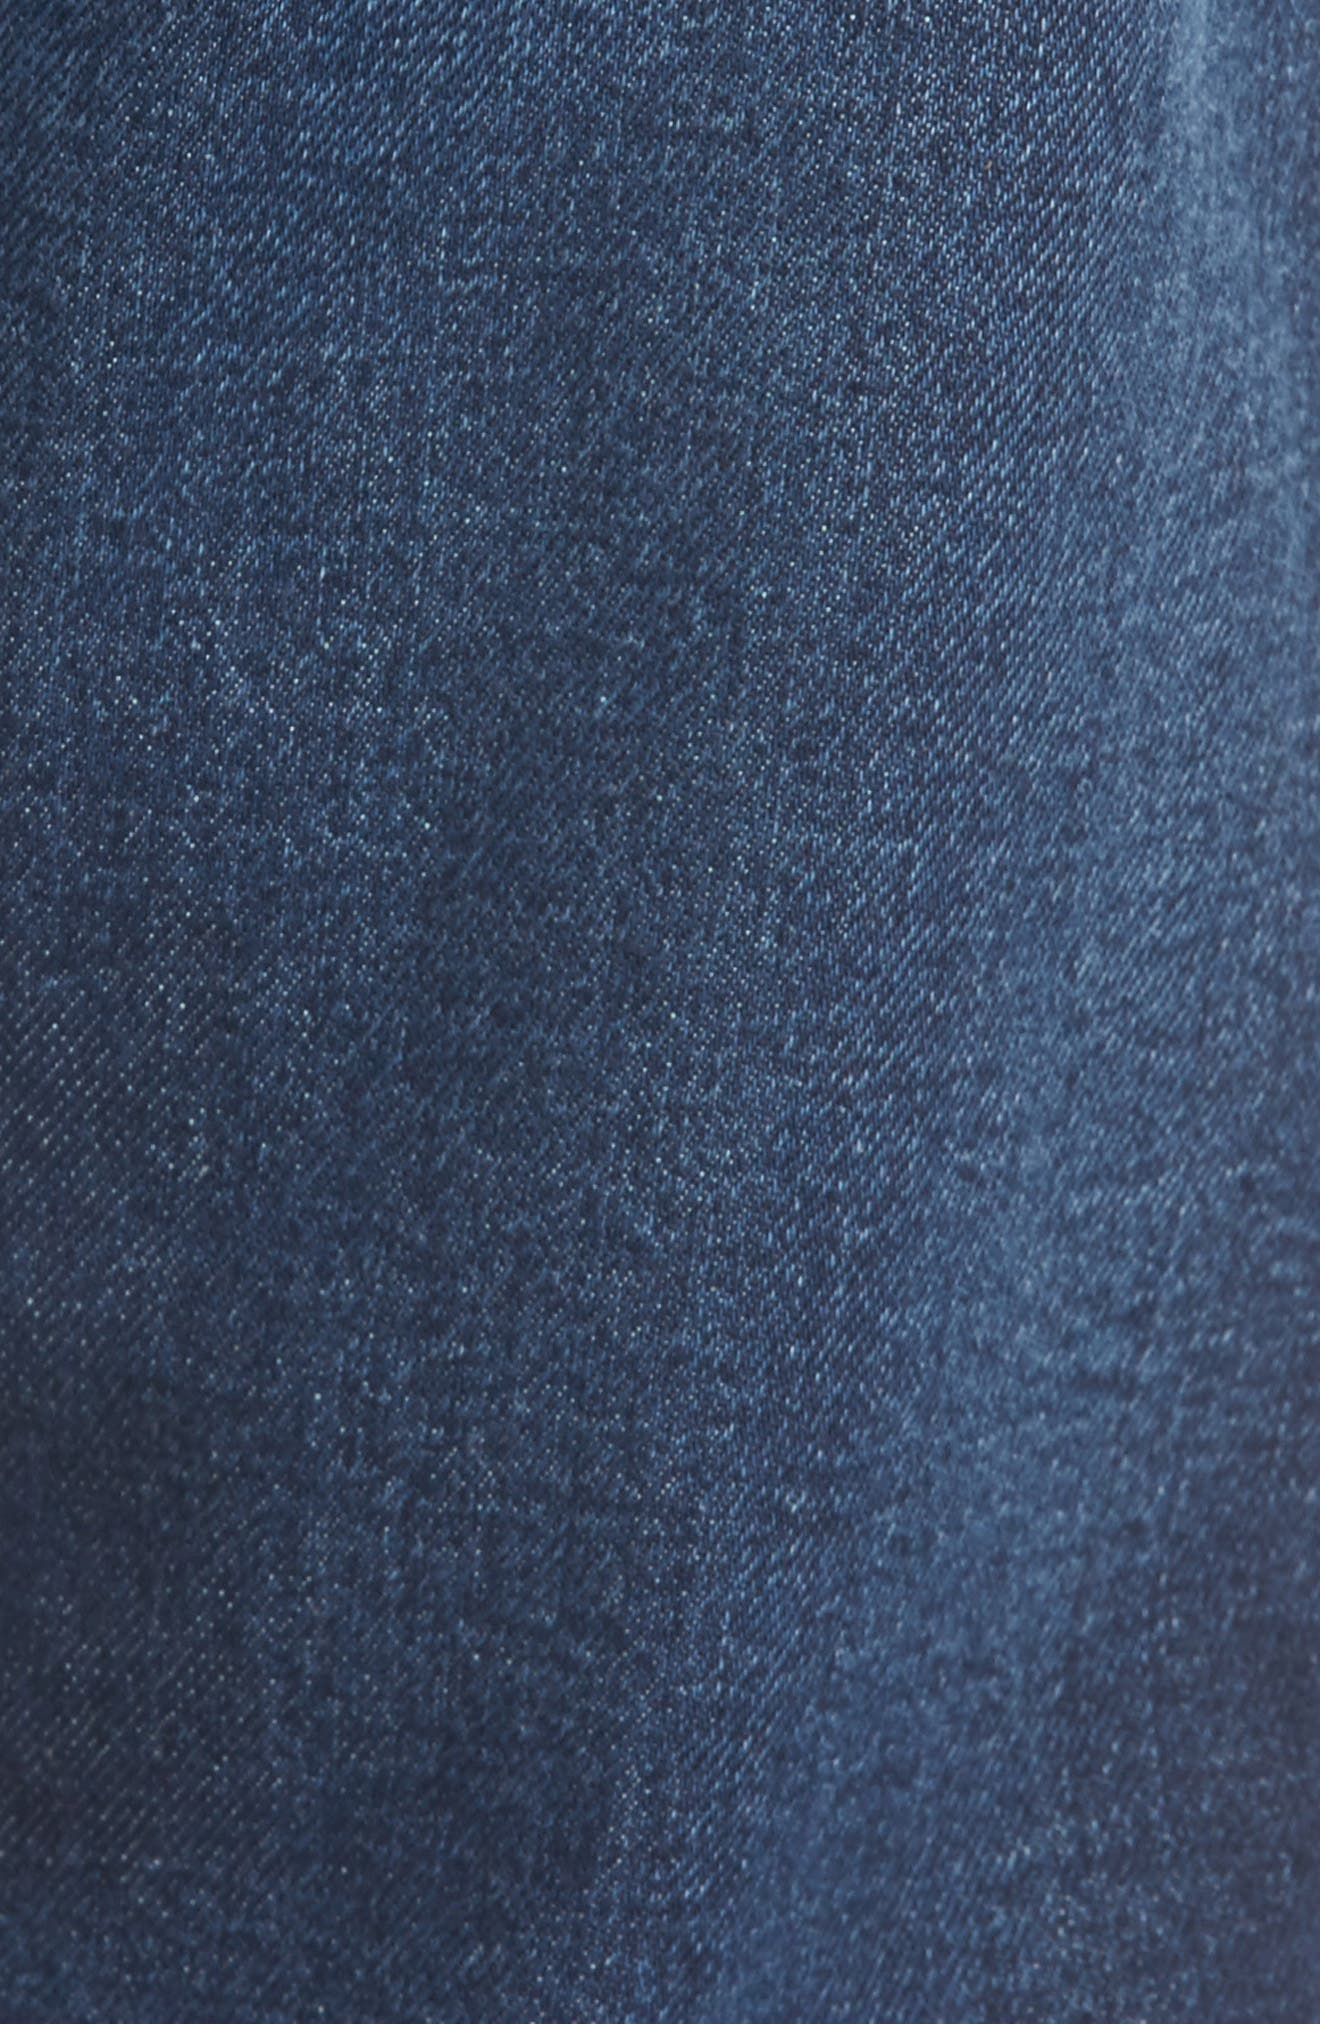 Tack Slim Fit Jeans,                             Alternate thumbnail 5, color,                             401